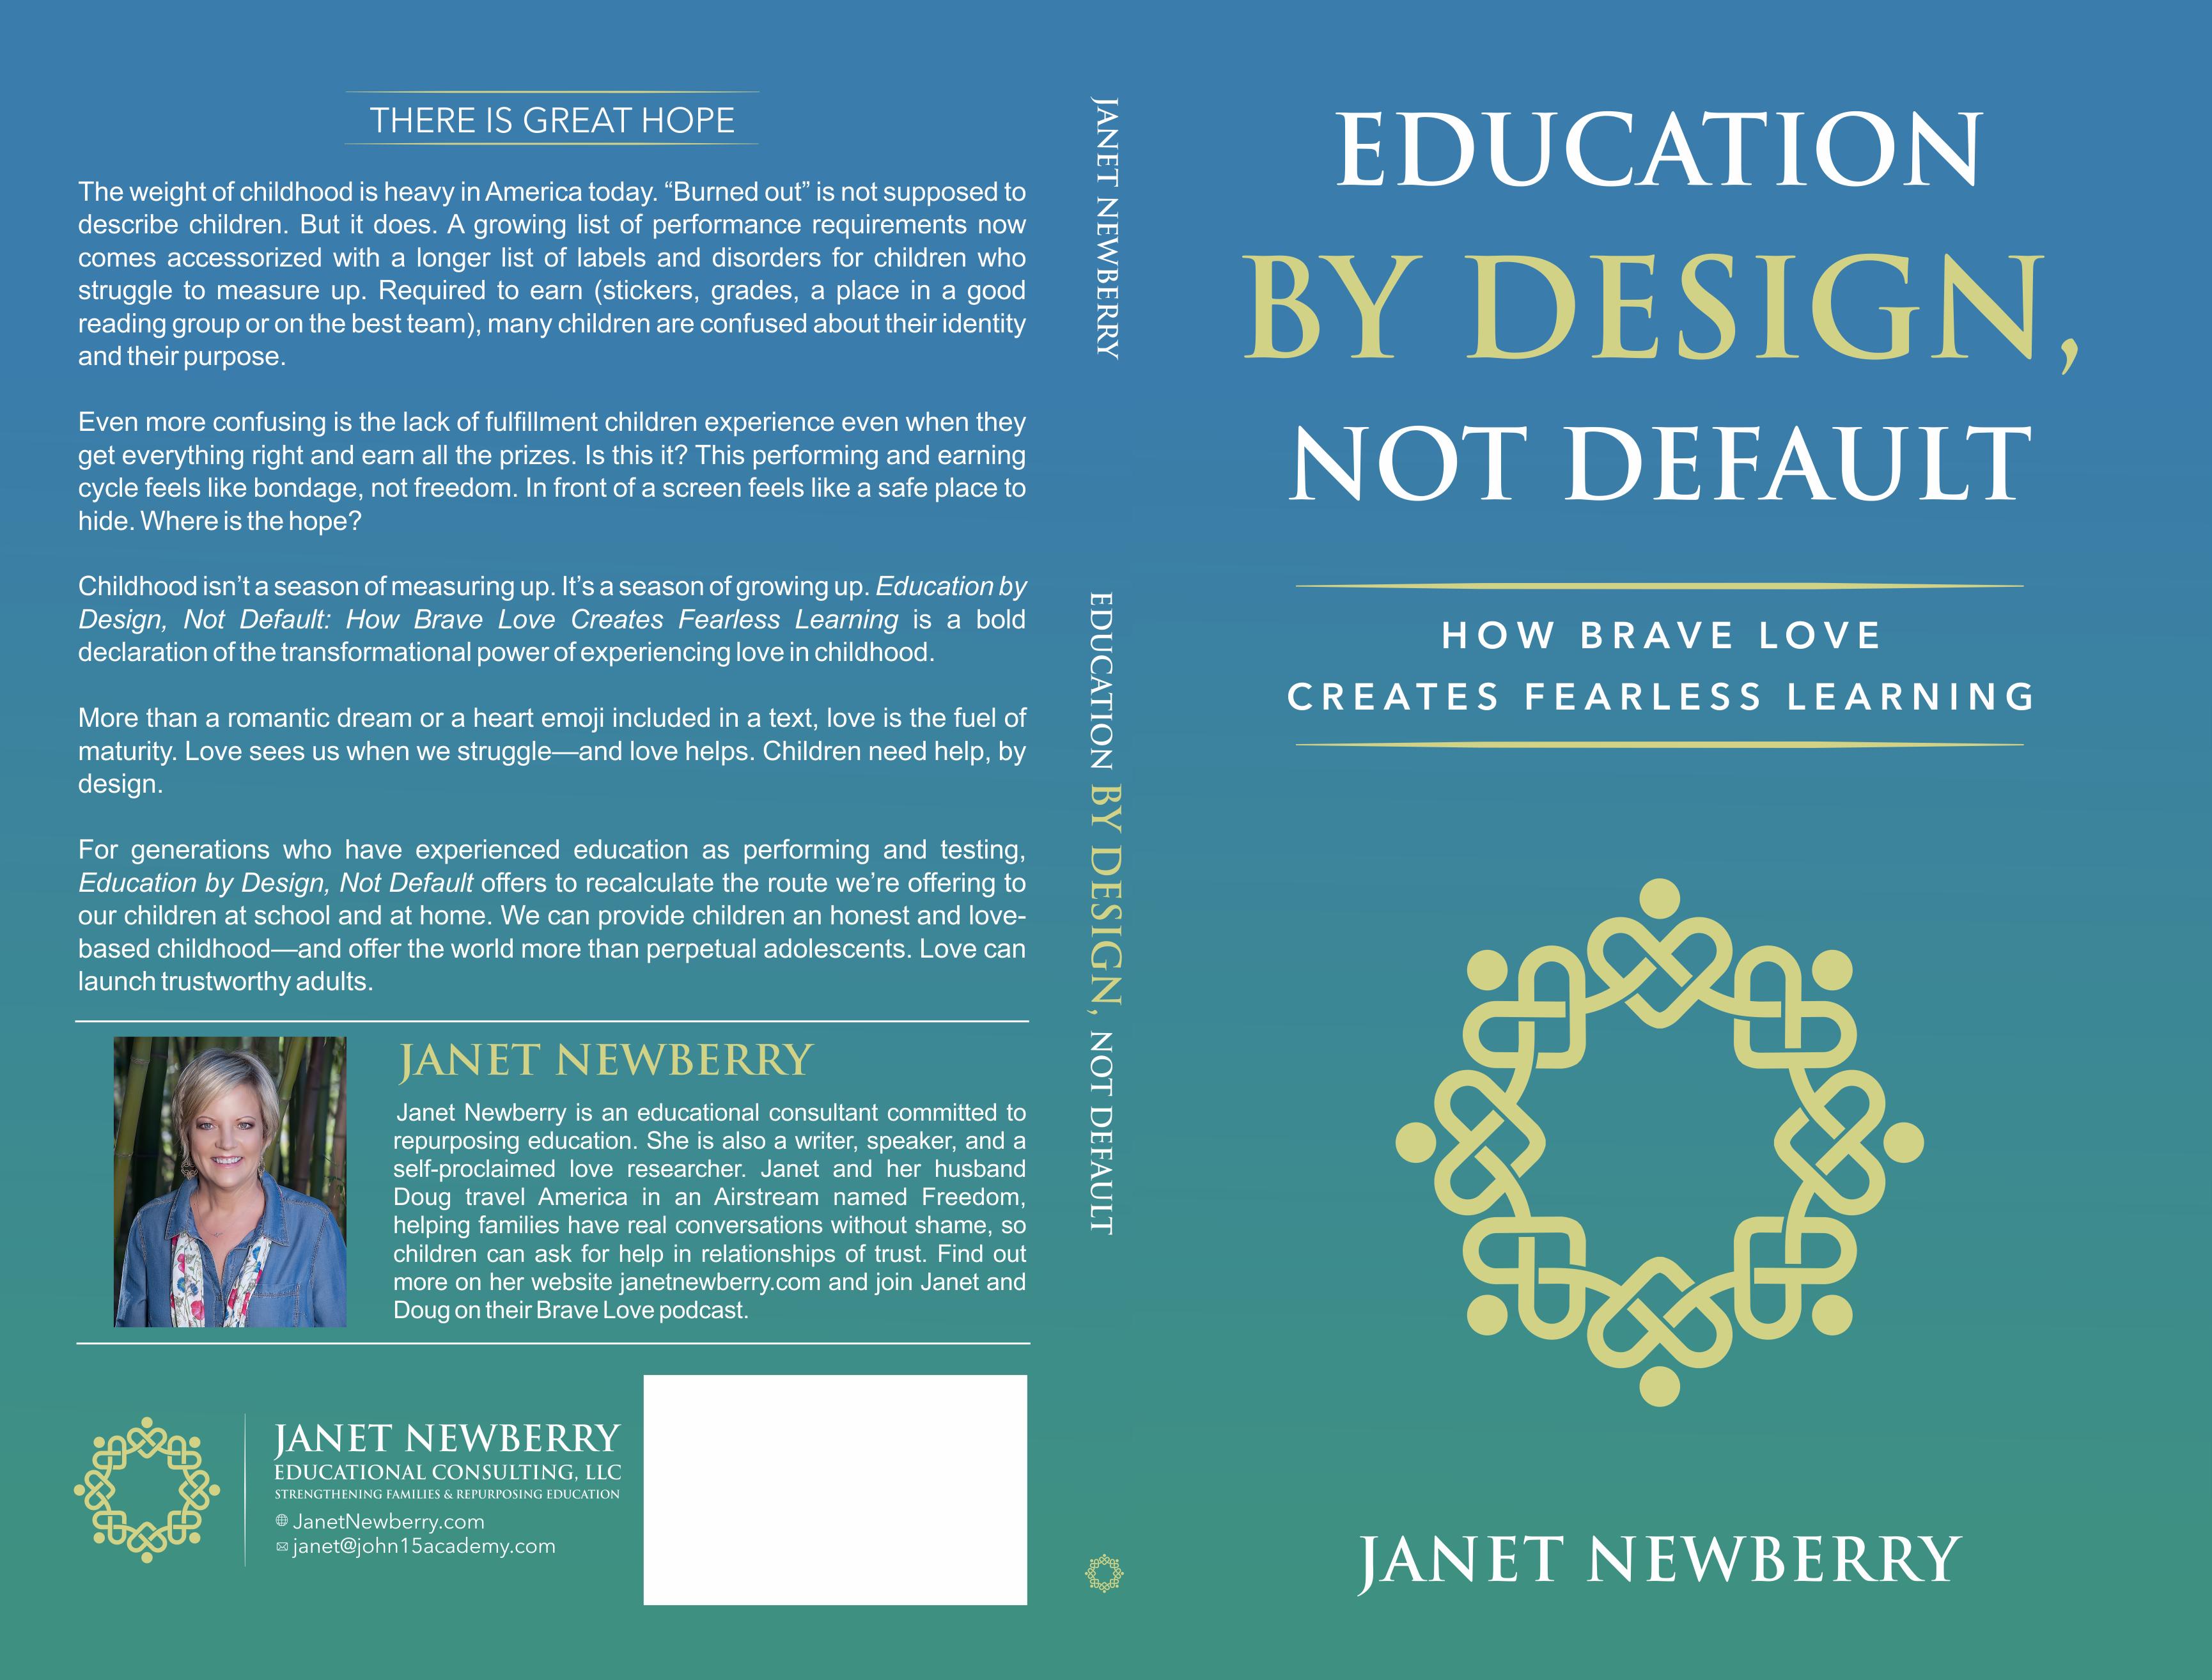 Education By Design--Not Default